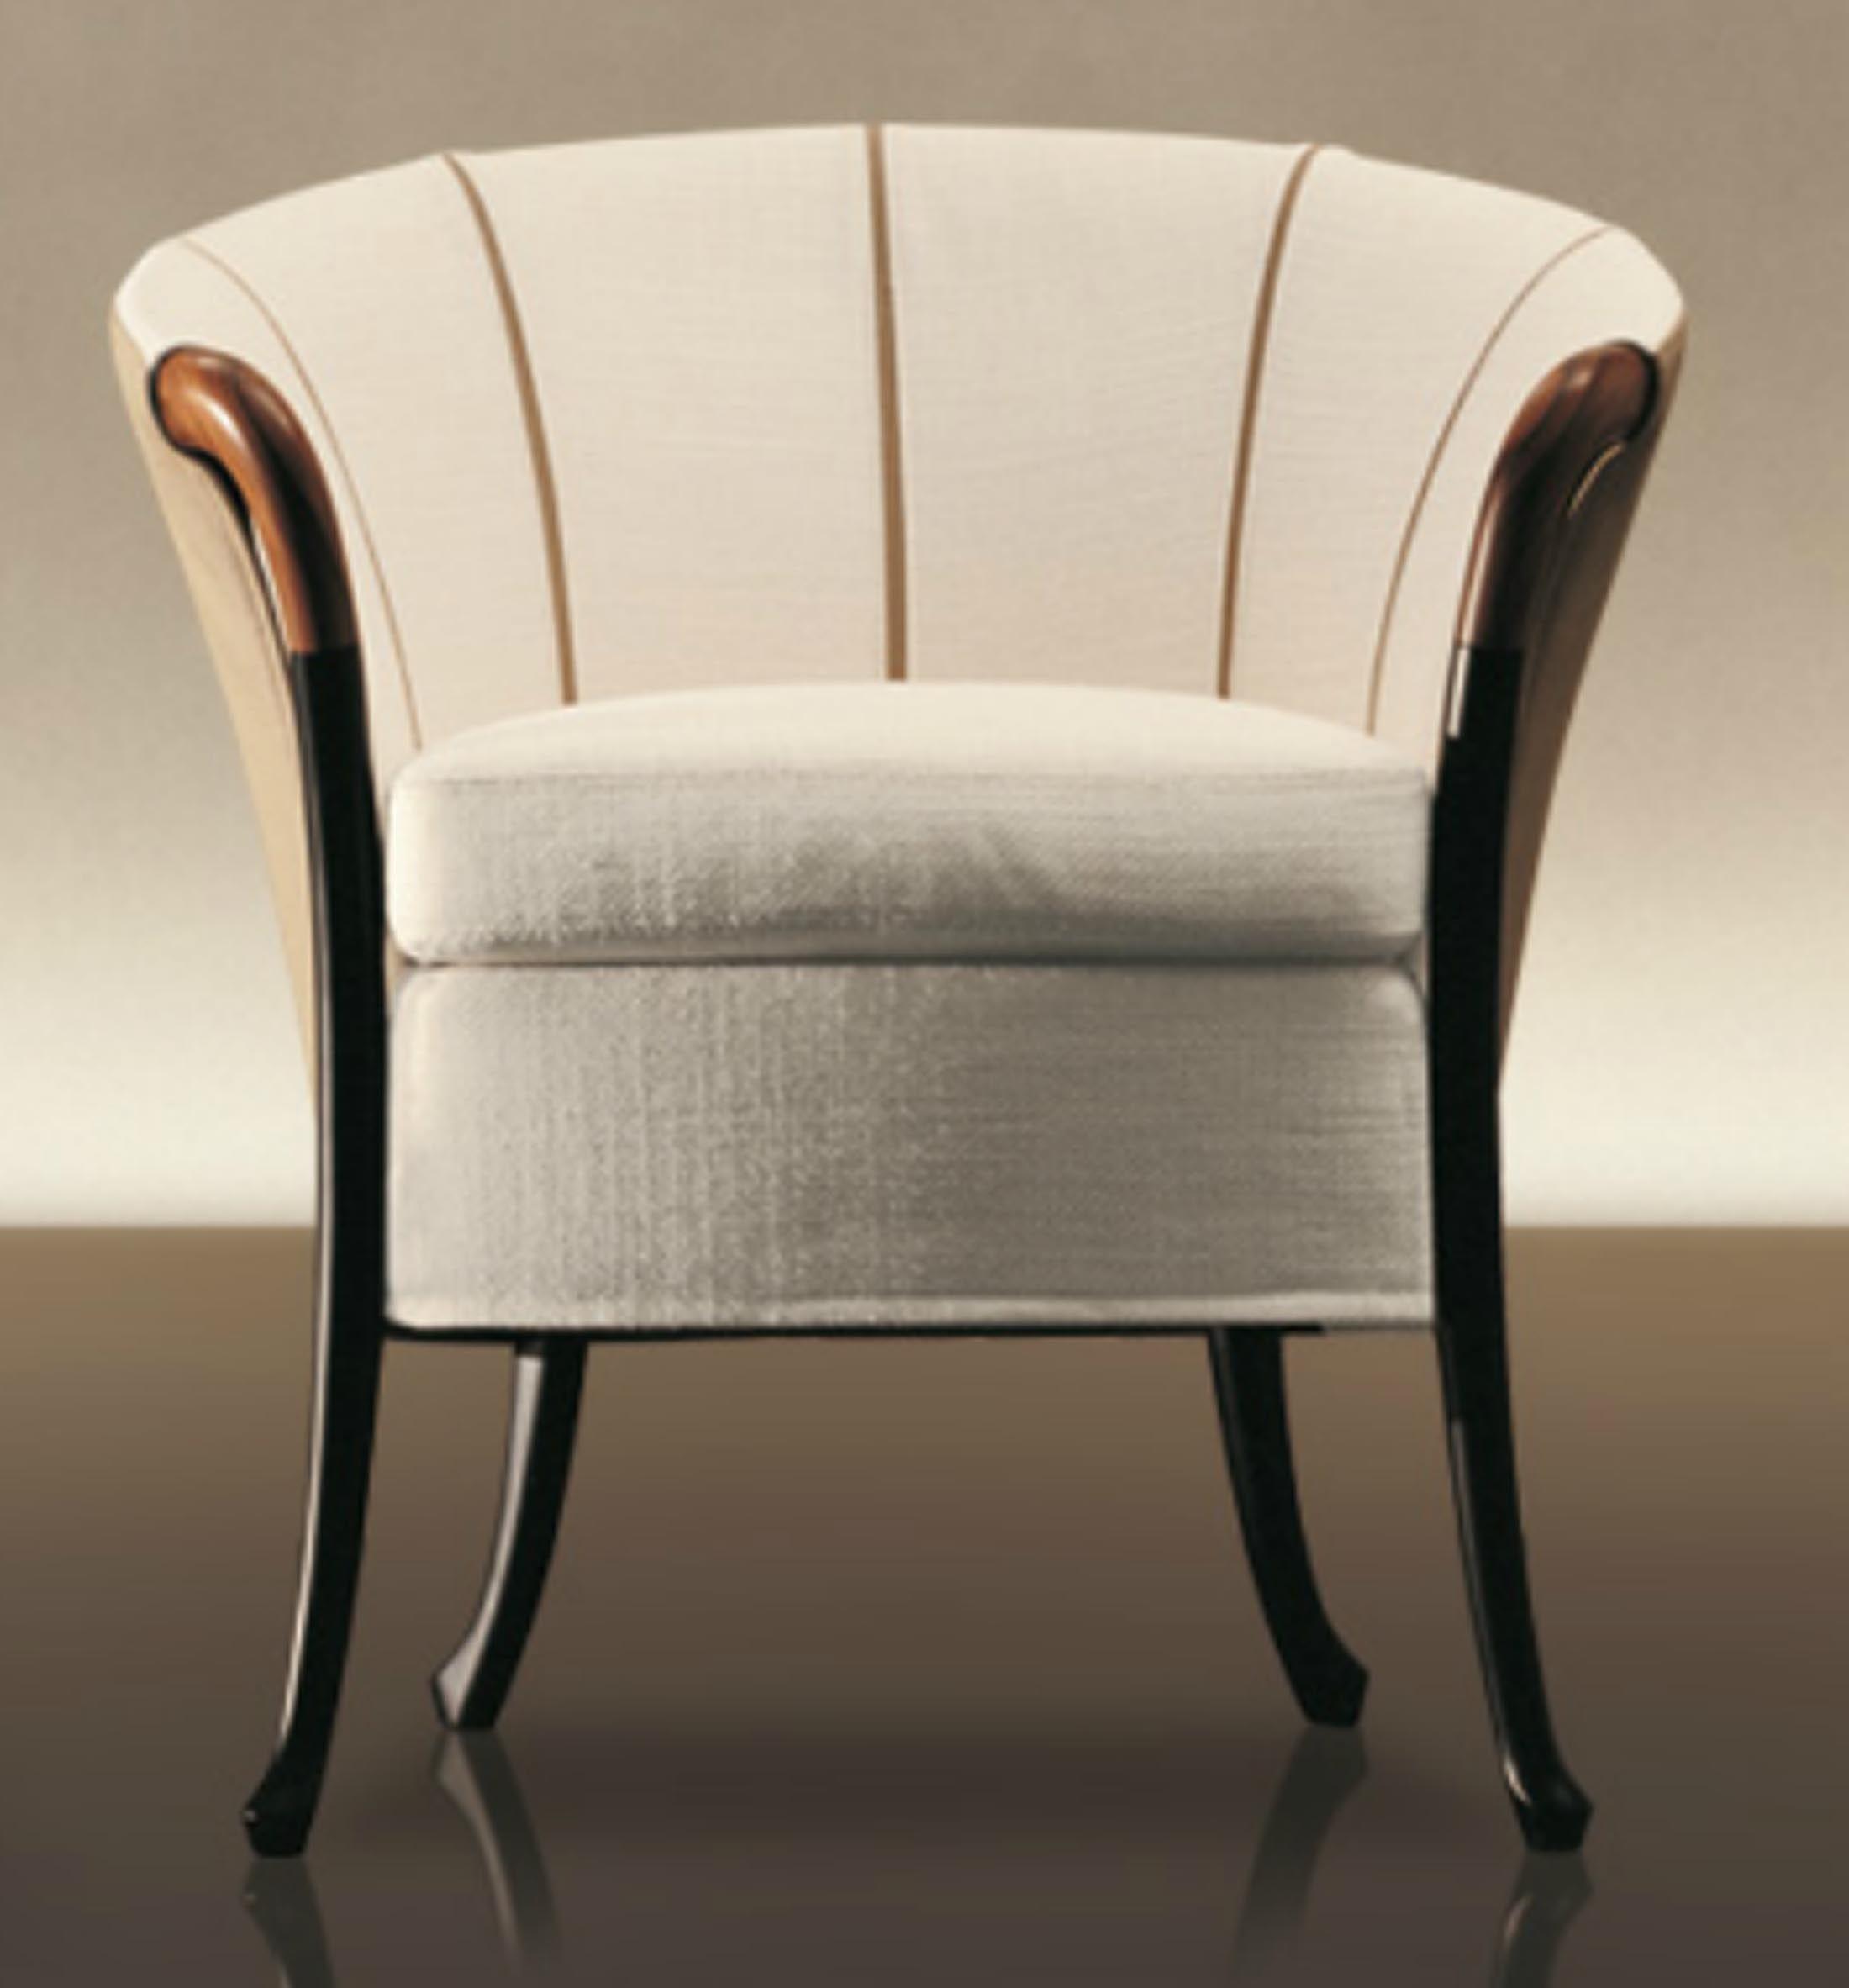 Progetti blossom Single seater sofa, Sofa furniture